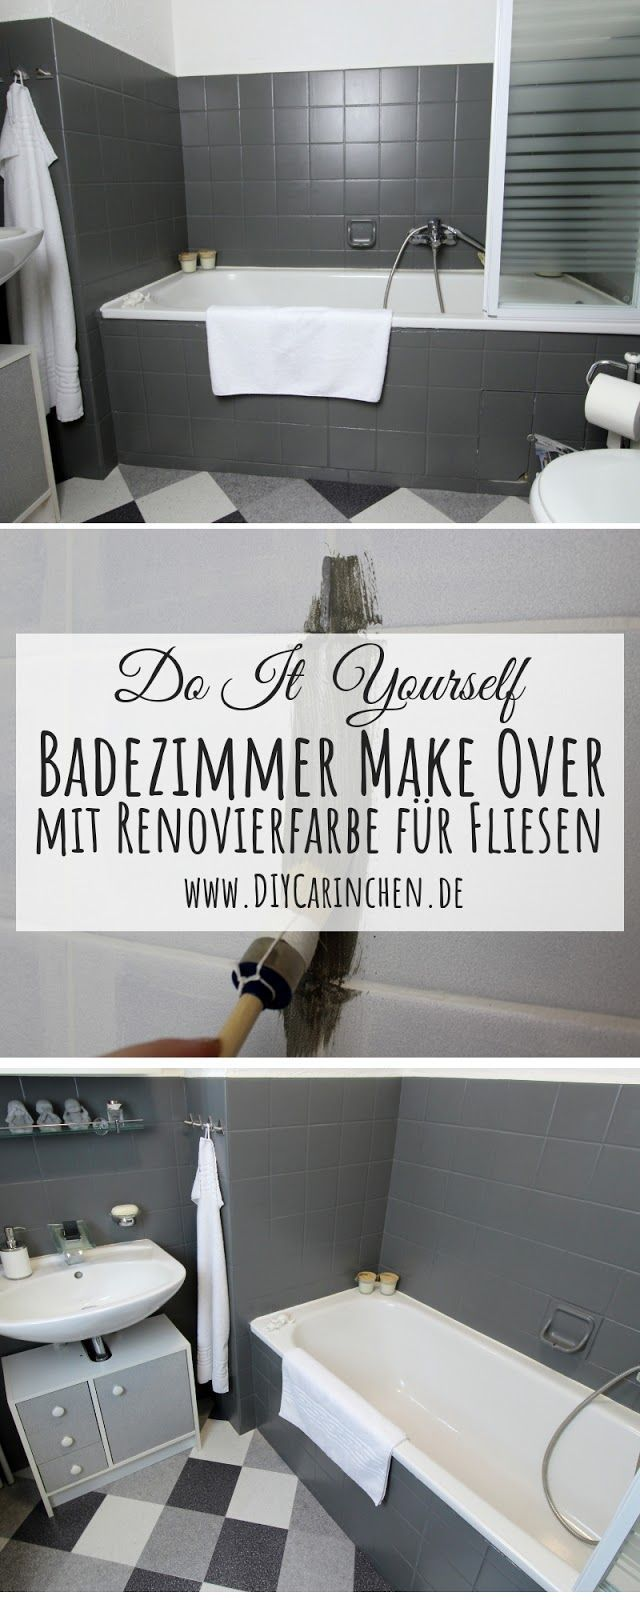 Bastelidee Diy Basteln Selbermachen Makeover Upcycling Badezimmer Interior Modern Anleitung Tutorial Anzeige Diy Bathroom Renovations Upcycled Home Decor Diy Bathroom Decor